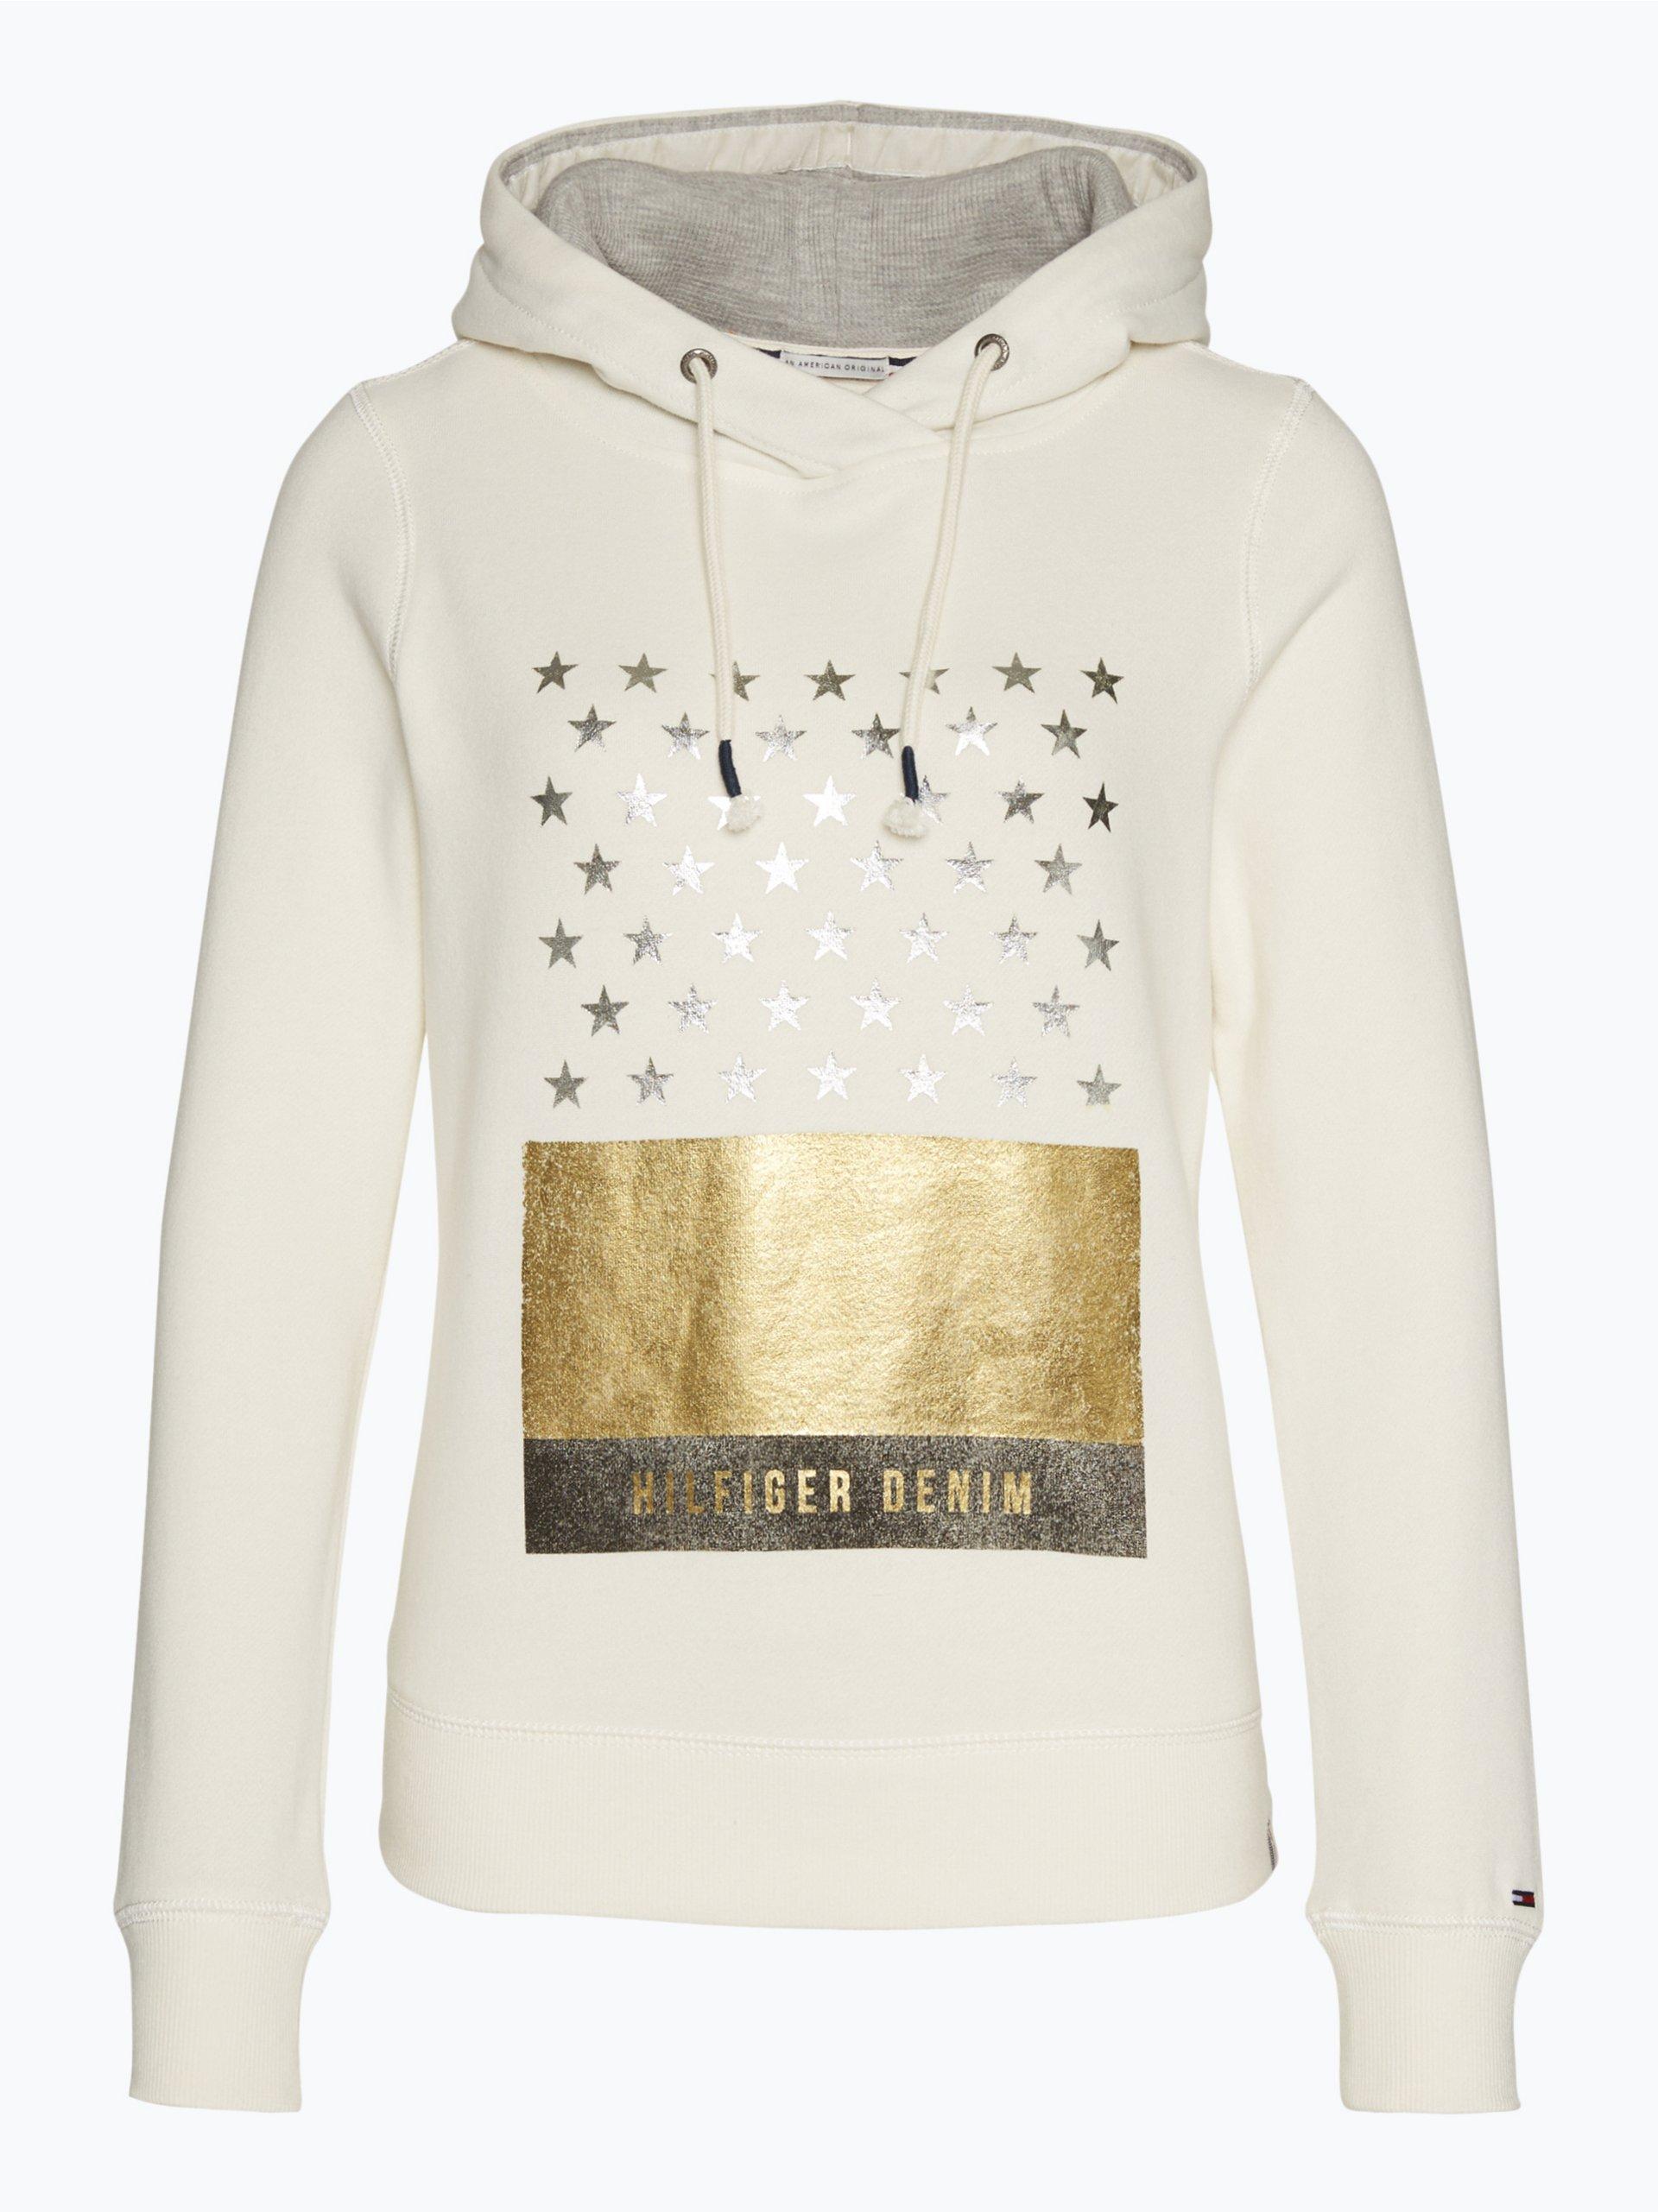 hilfiger denim damen sweatshirt ecru gemustert online. Black Bedroom Furniture Sets. Home Design Ideas